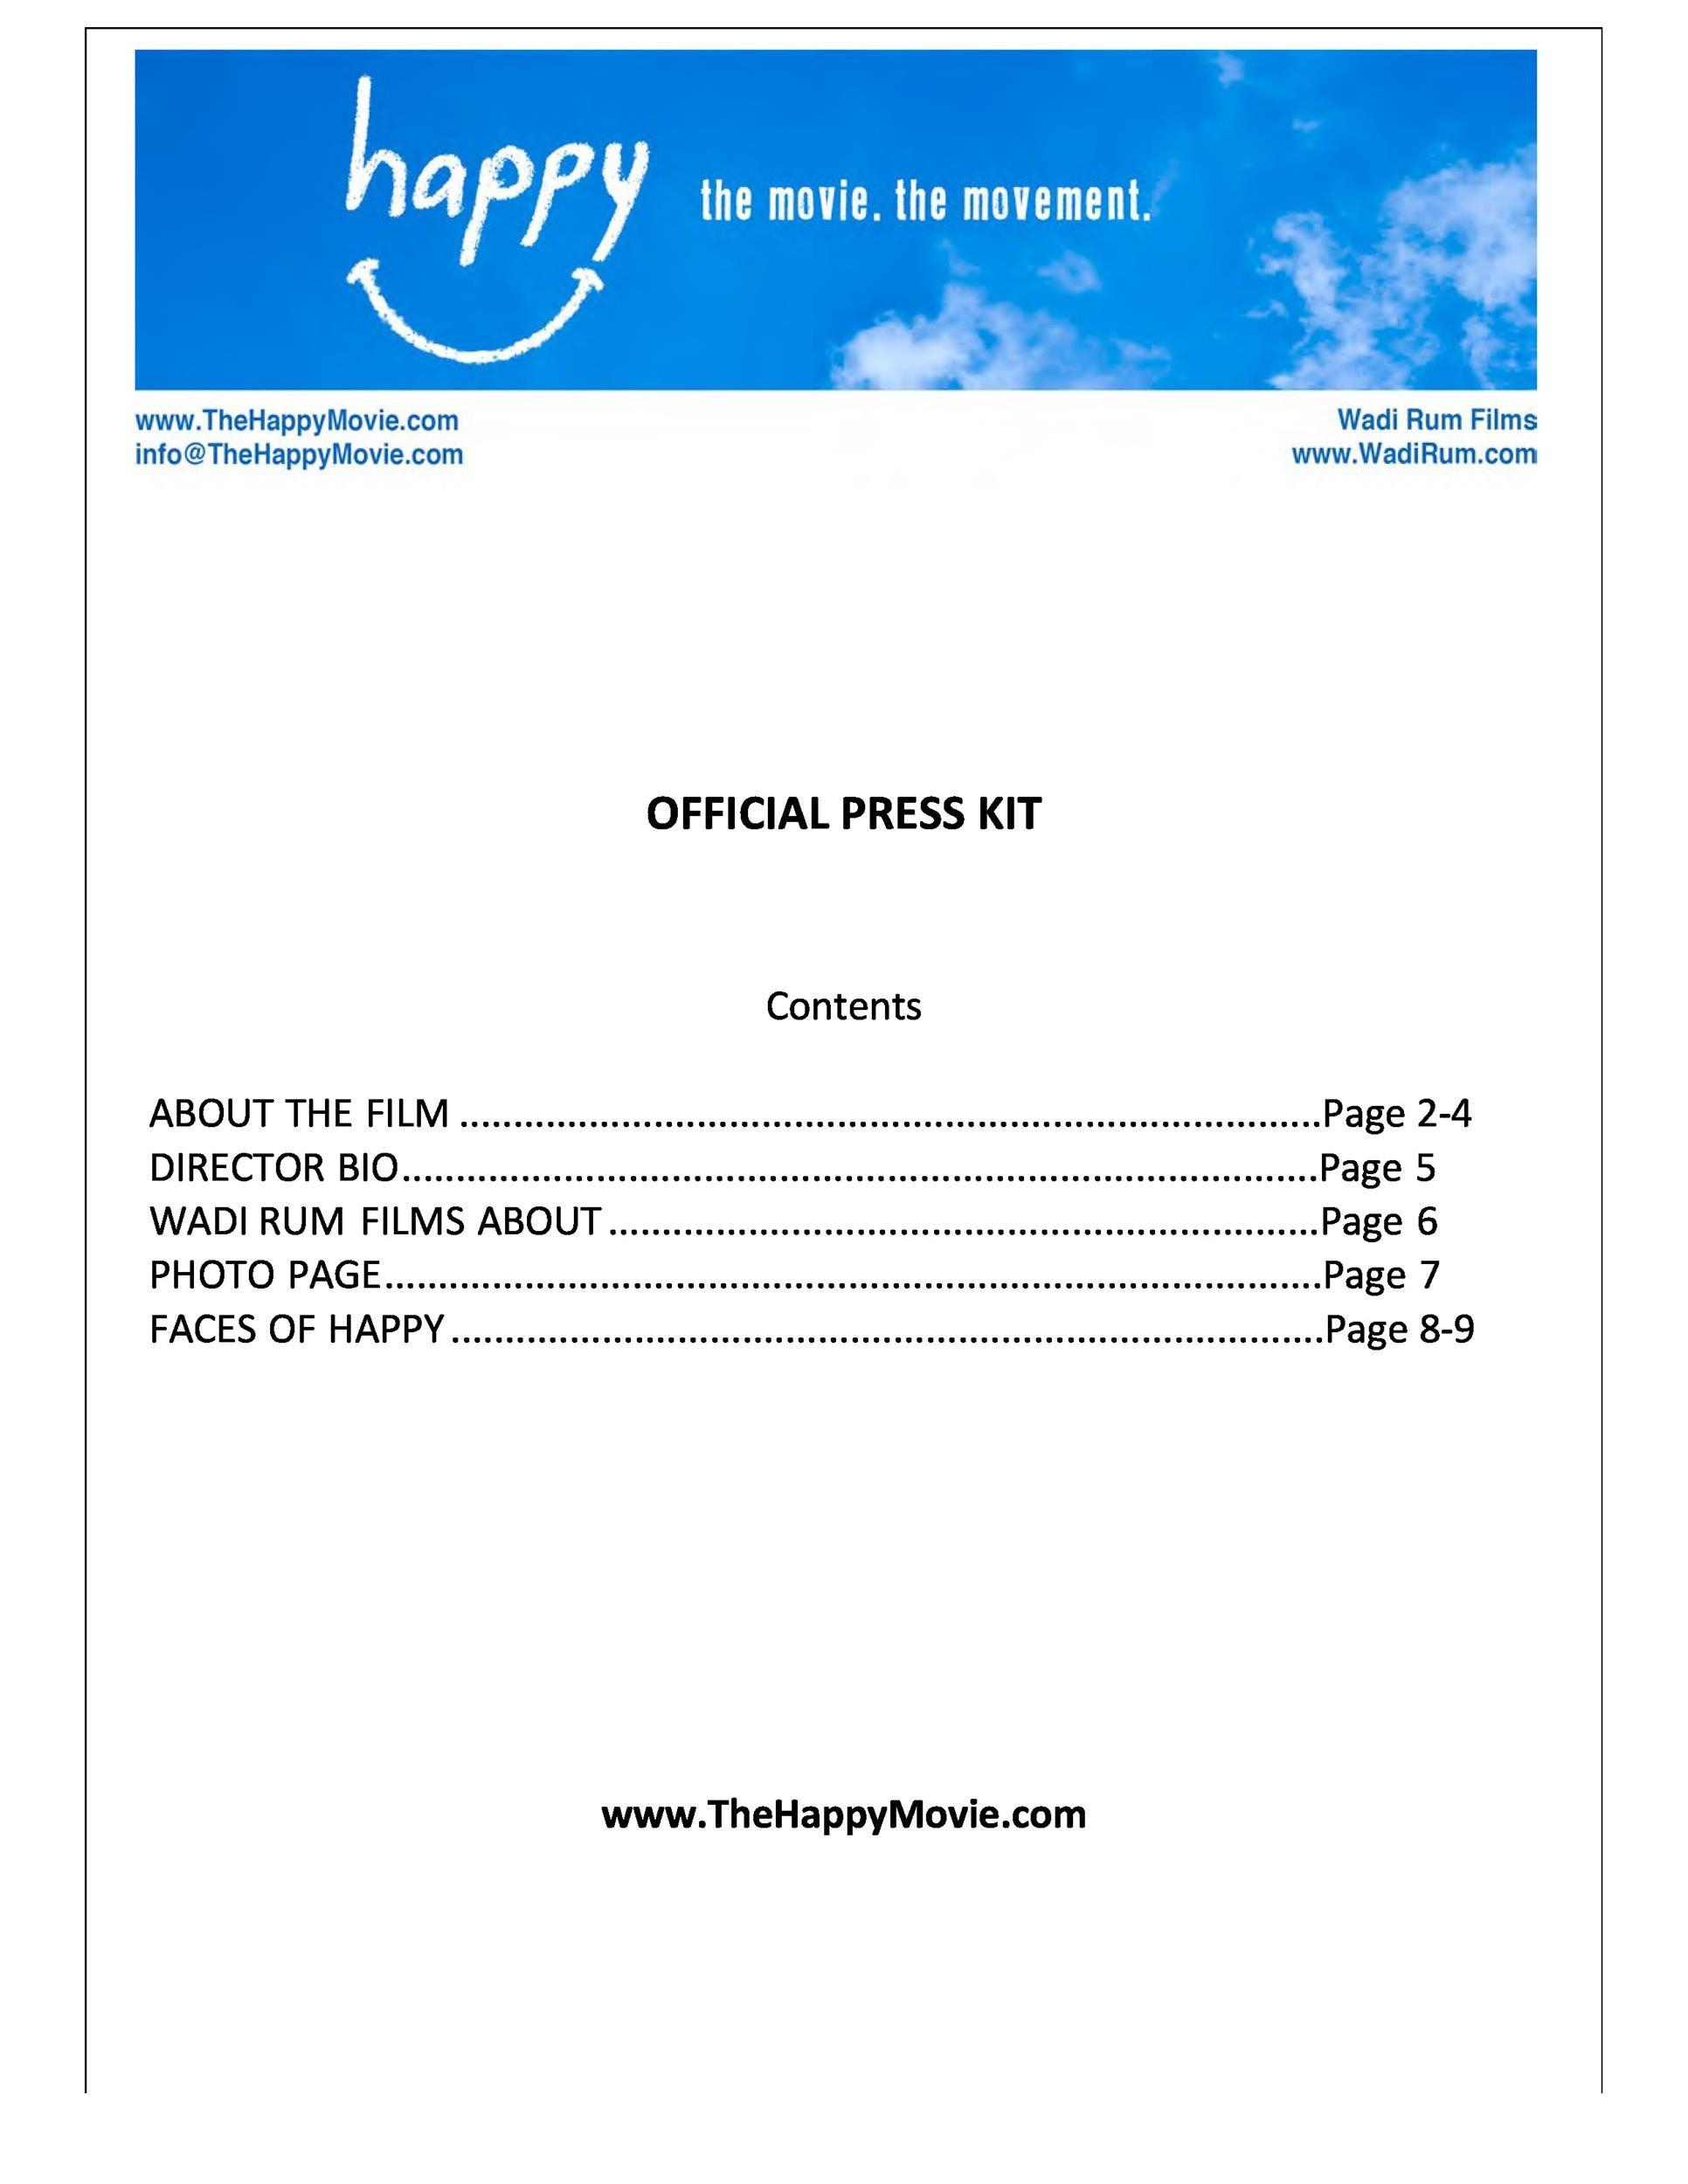 Free press kit template 25